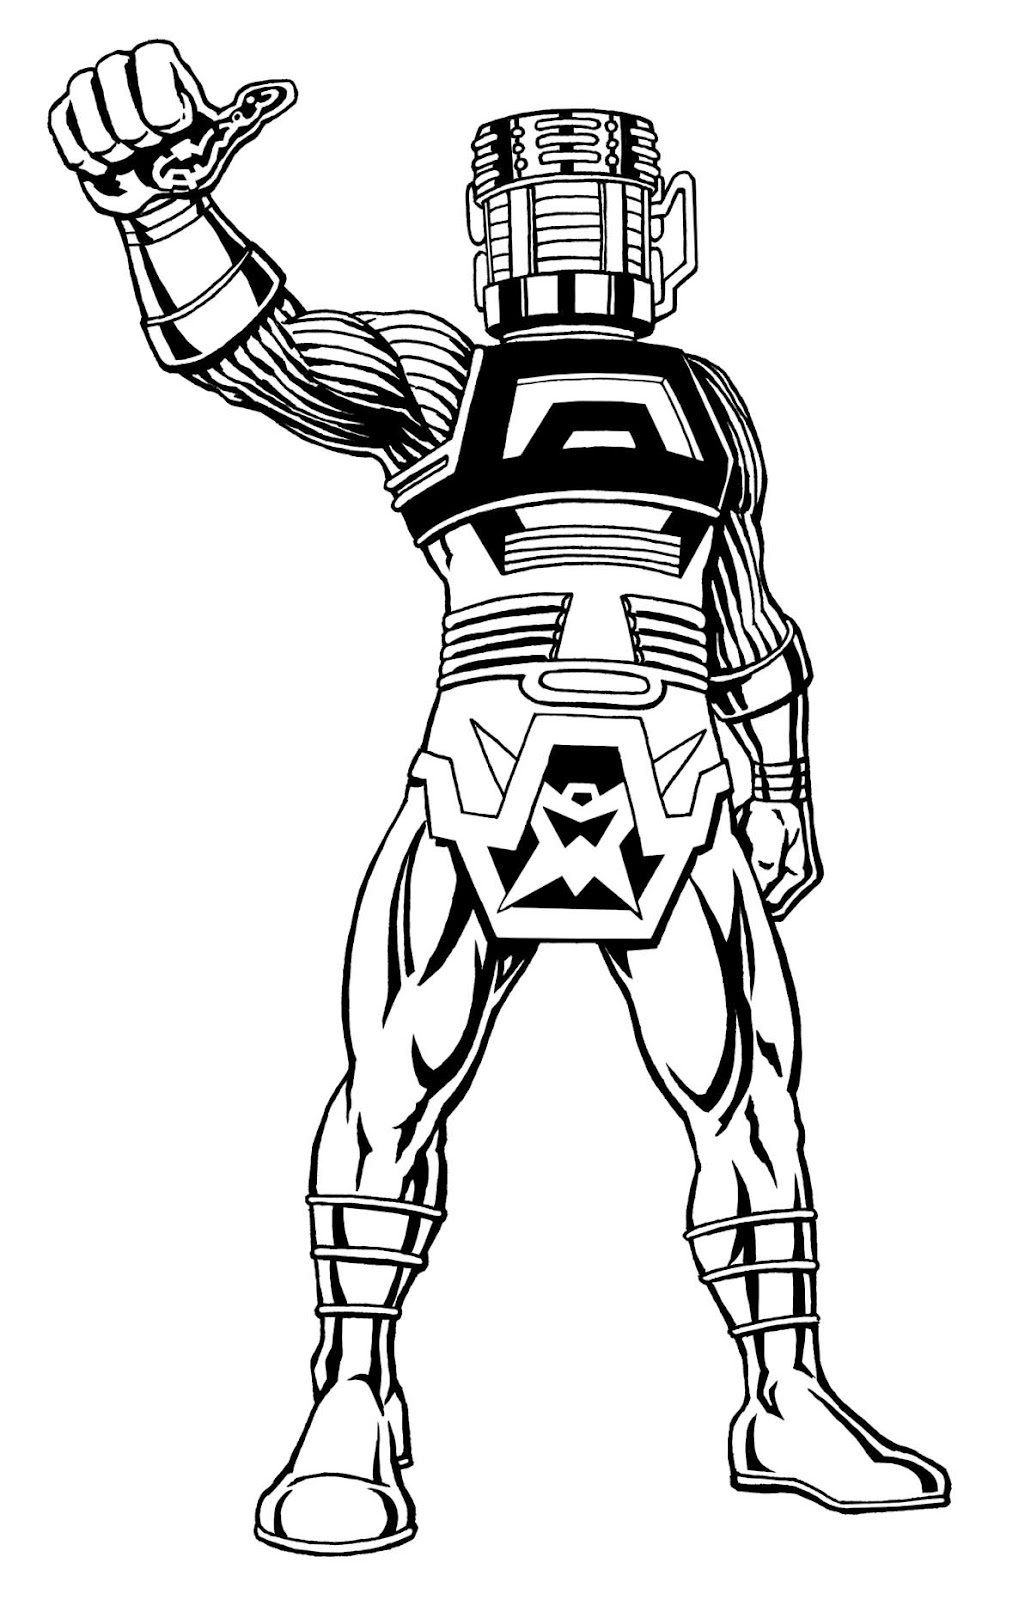 The John Douglas (Mostly) Comic Book Art Site: Handbook of